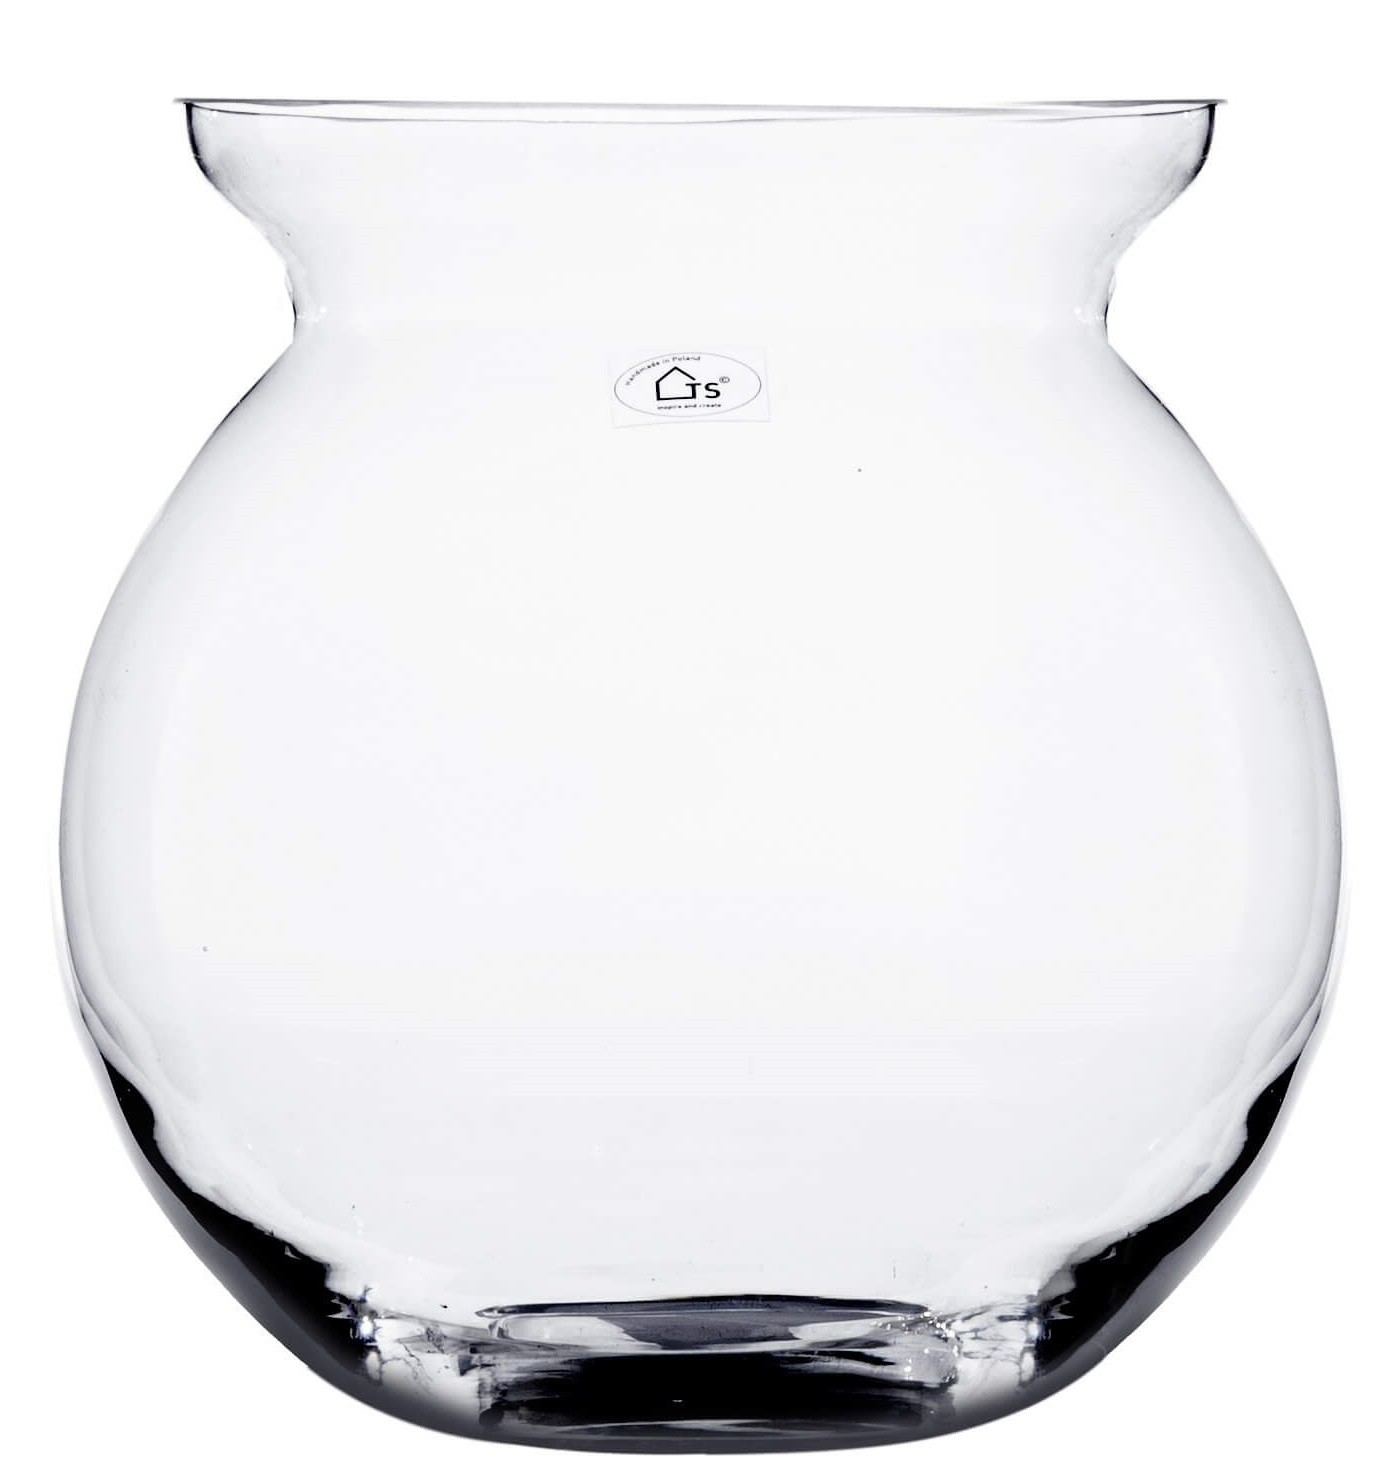 Vaso de Vidro Artesanal Polonês Mira 25x25cm